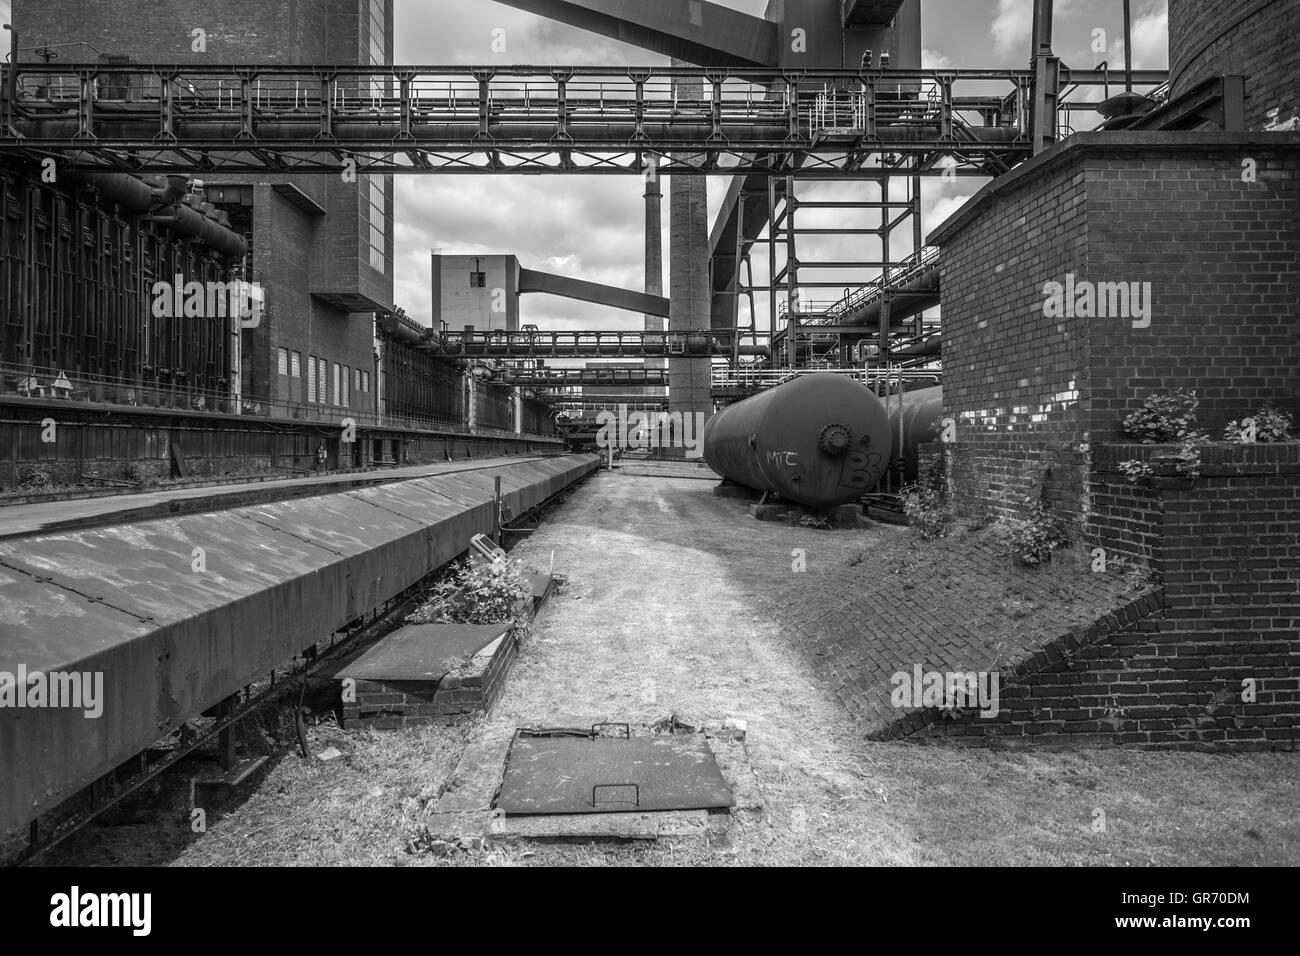 Zeche Zollverein - Stock Image